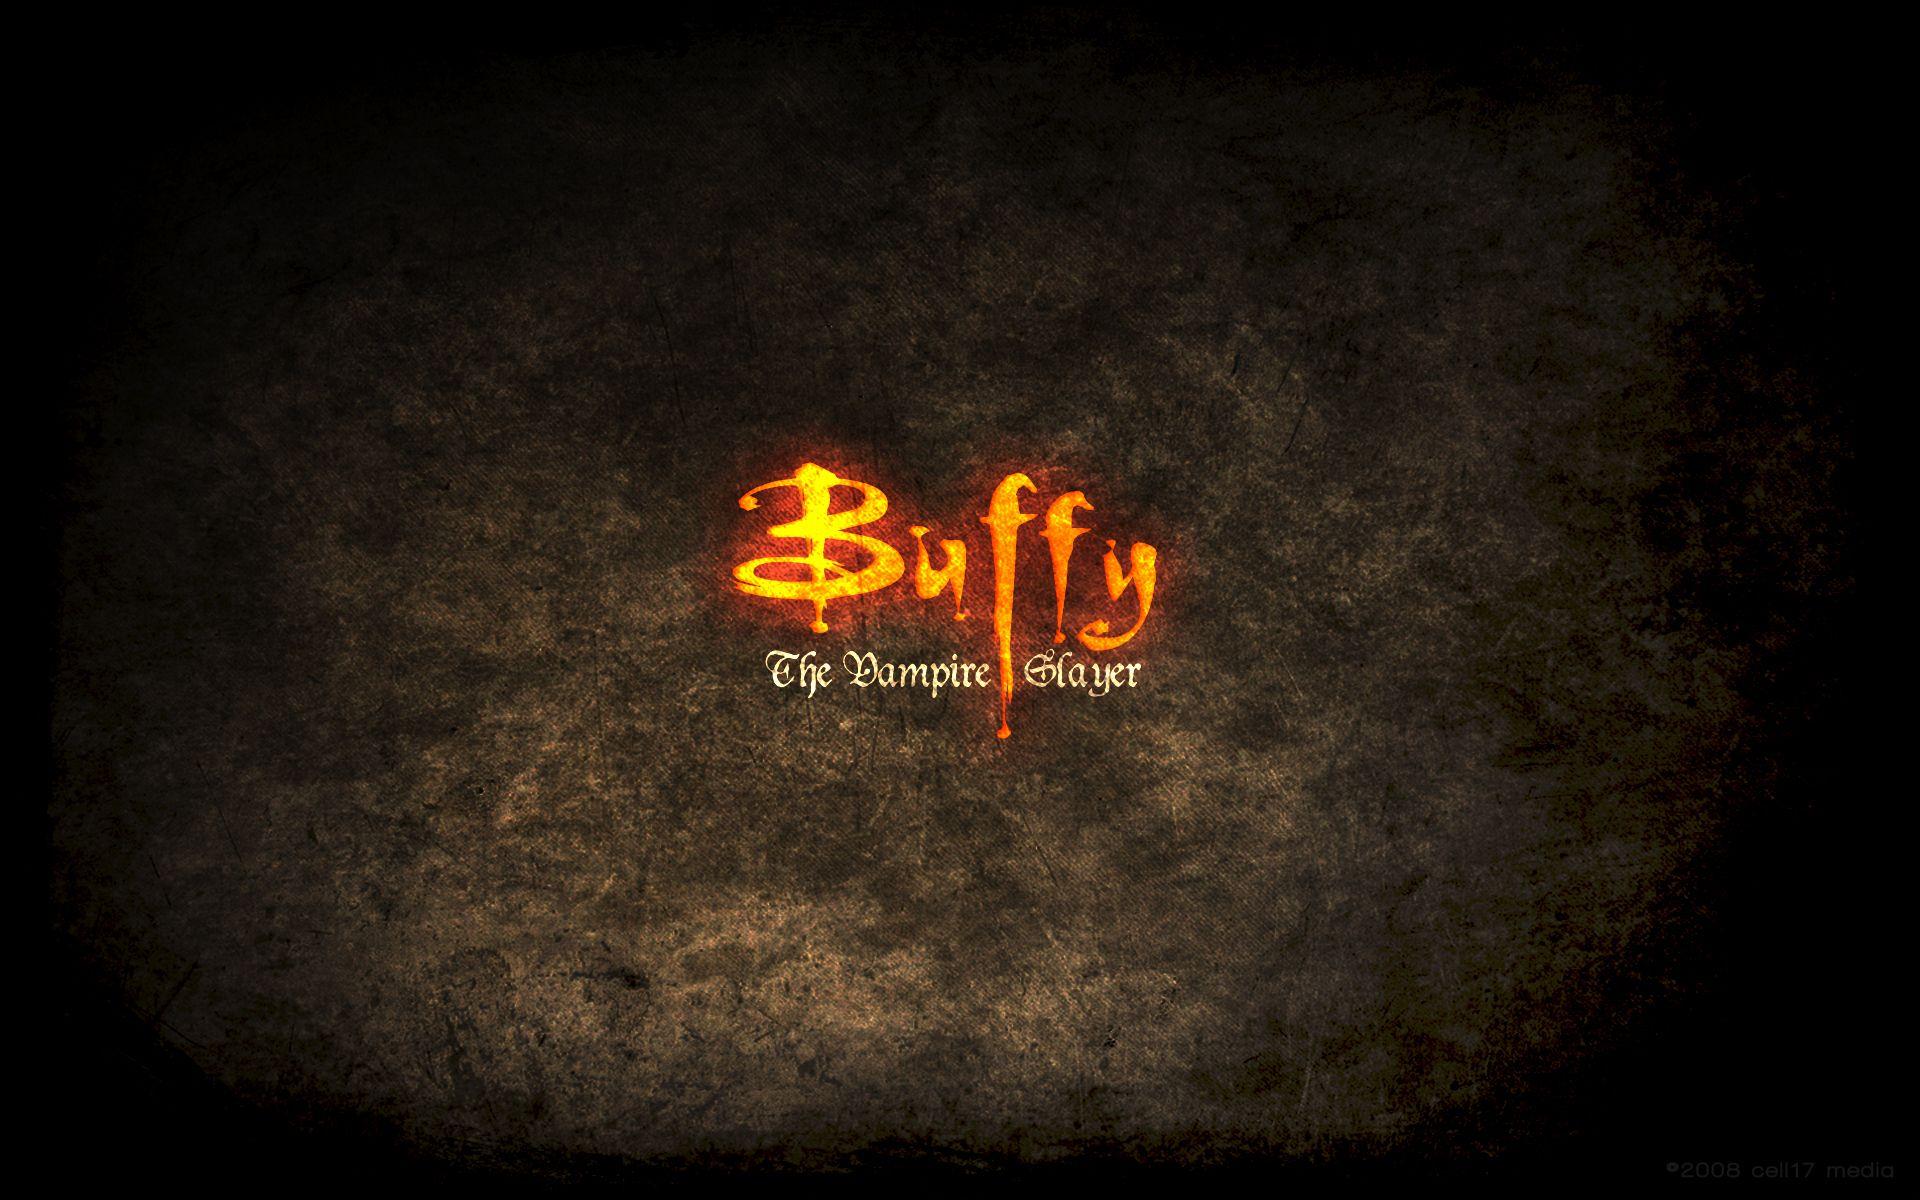 Tv Show Buffy Wallpaper Vampire Slayer Buffy The Vampire Slayer Buffy